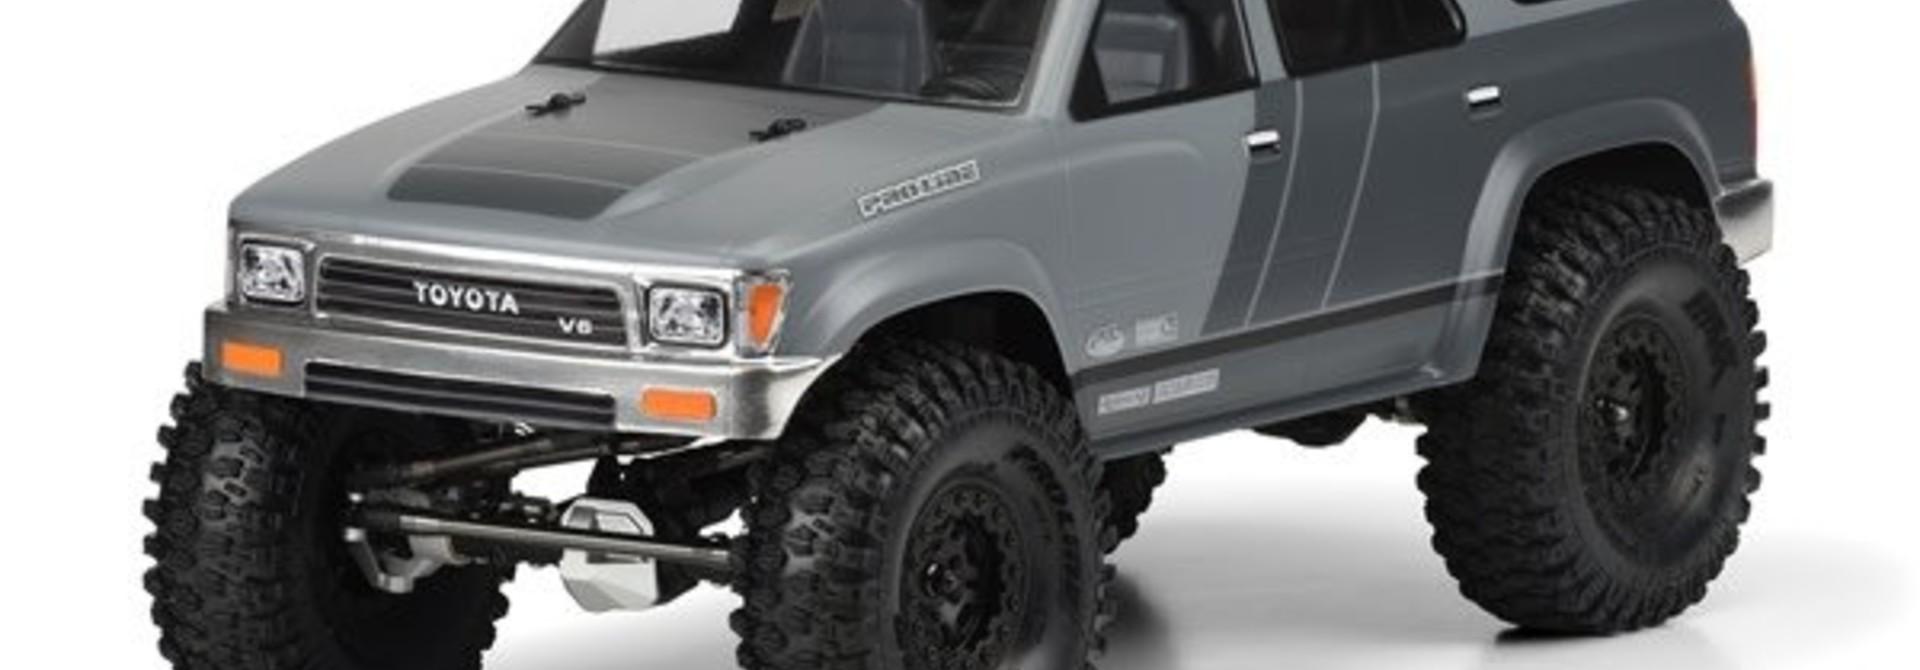 "1991 Toyota 4Runner Clr Bdy 12.3"" (313mm) WB Crawlers"